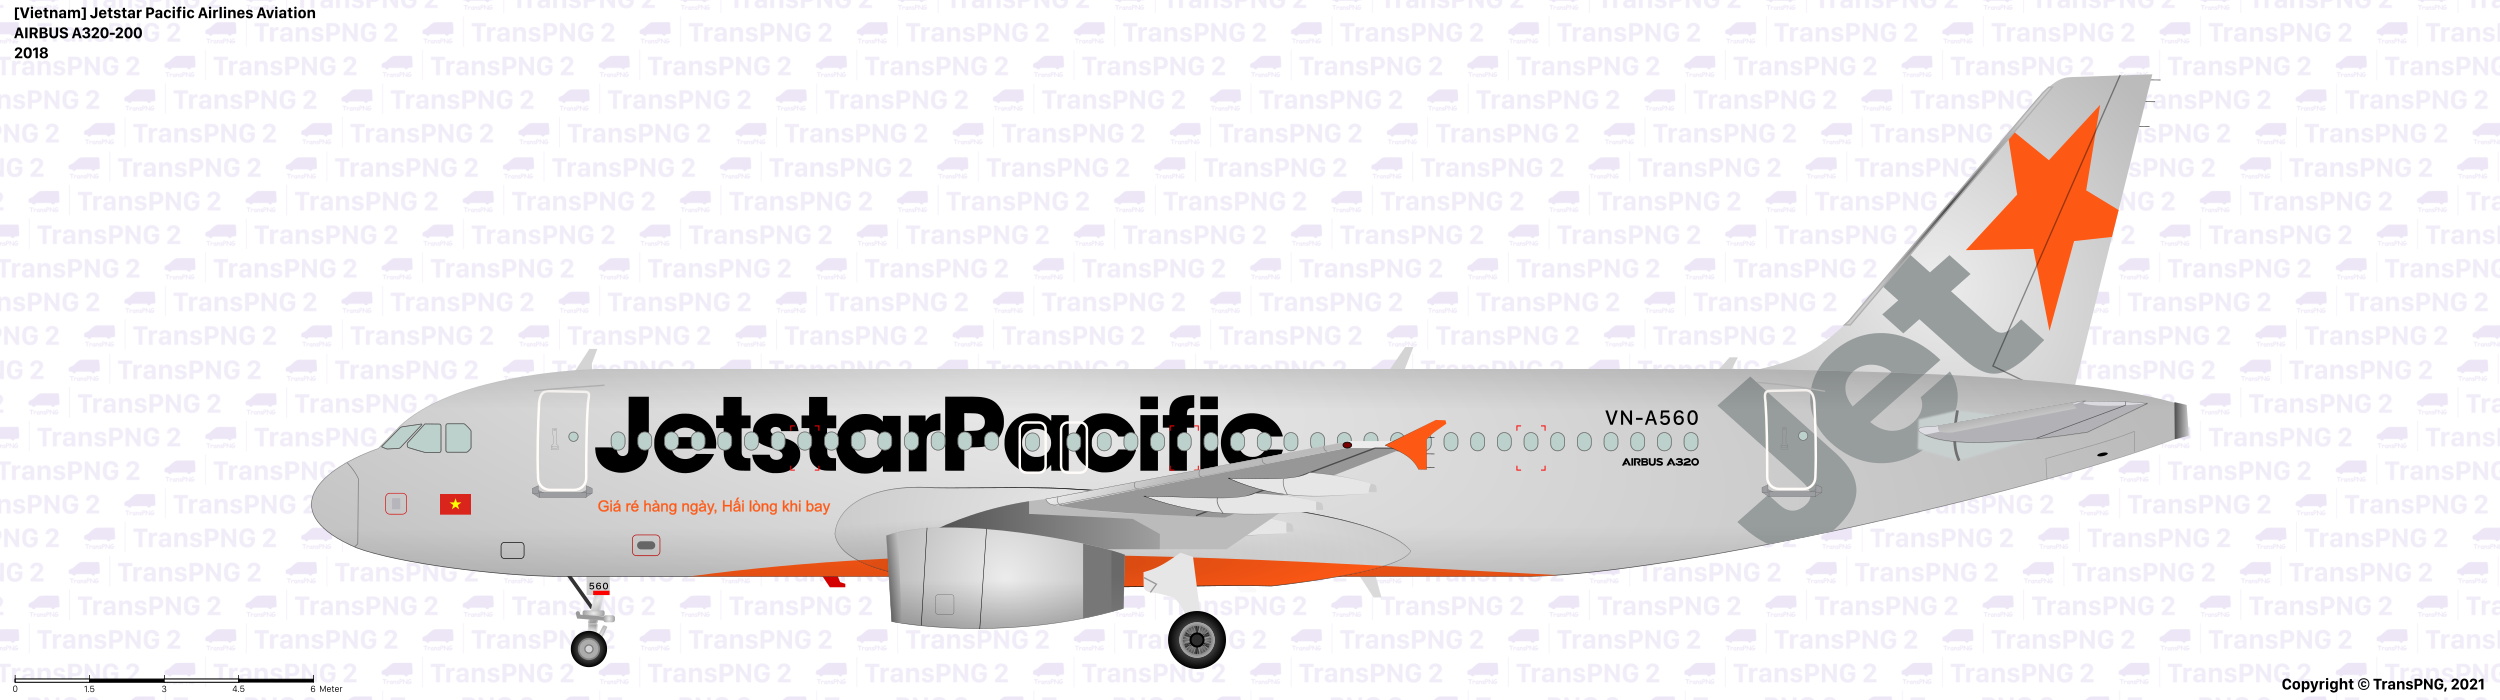 [25090] Jetstar Pacific Airlines Aviation 25090